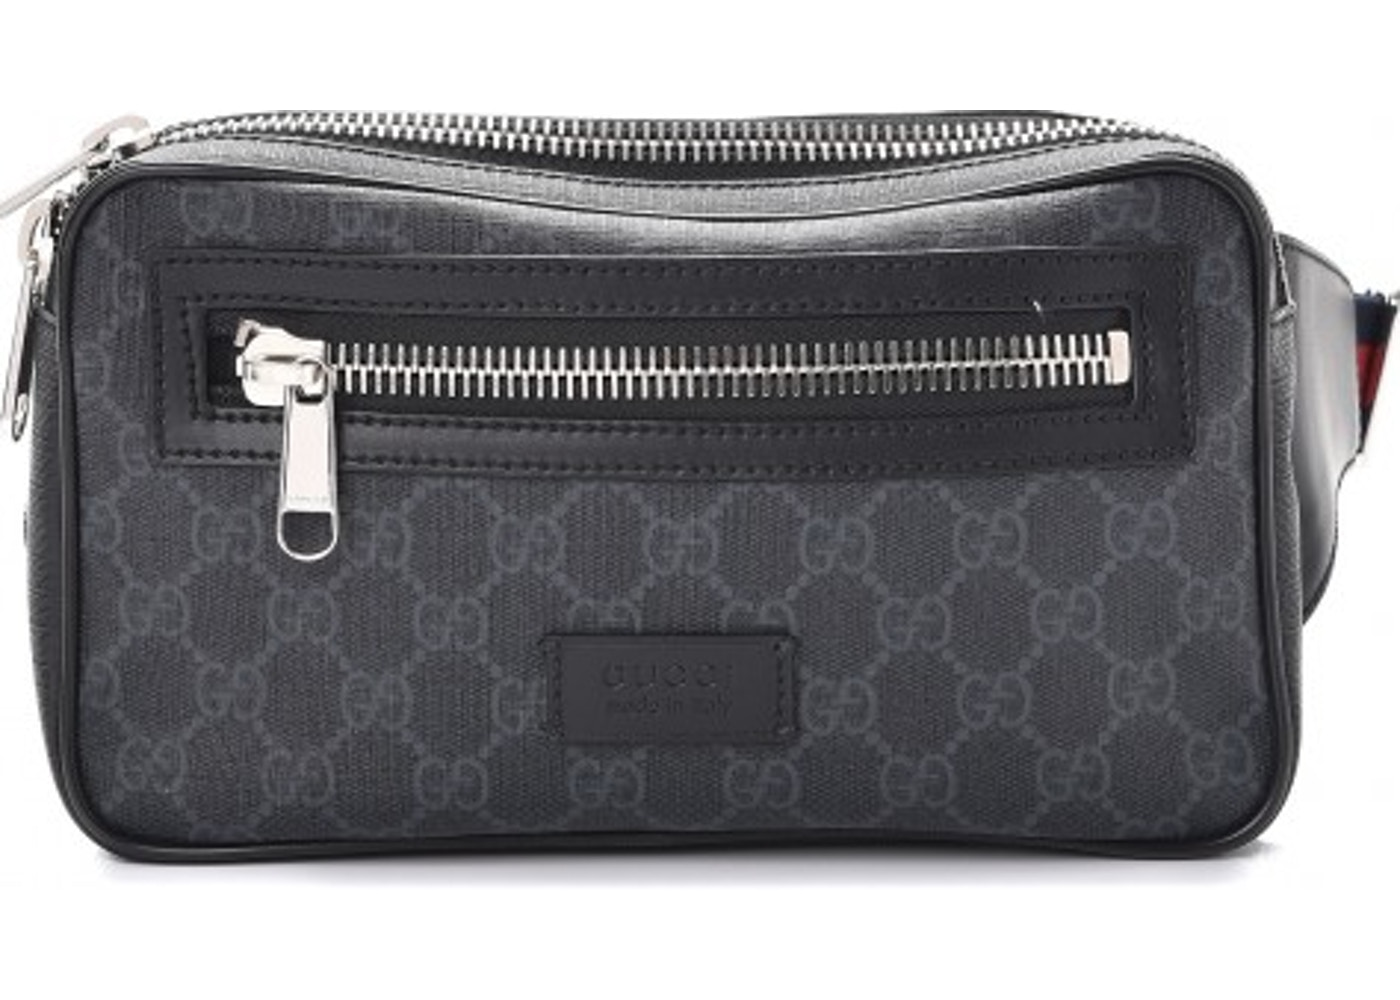 8d4234700d12f Gucci Belt Bag Monogram GG Supreme Web Stripe Strap Black